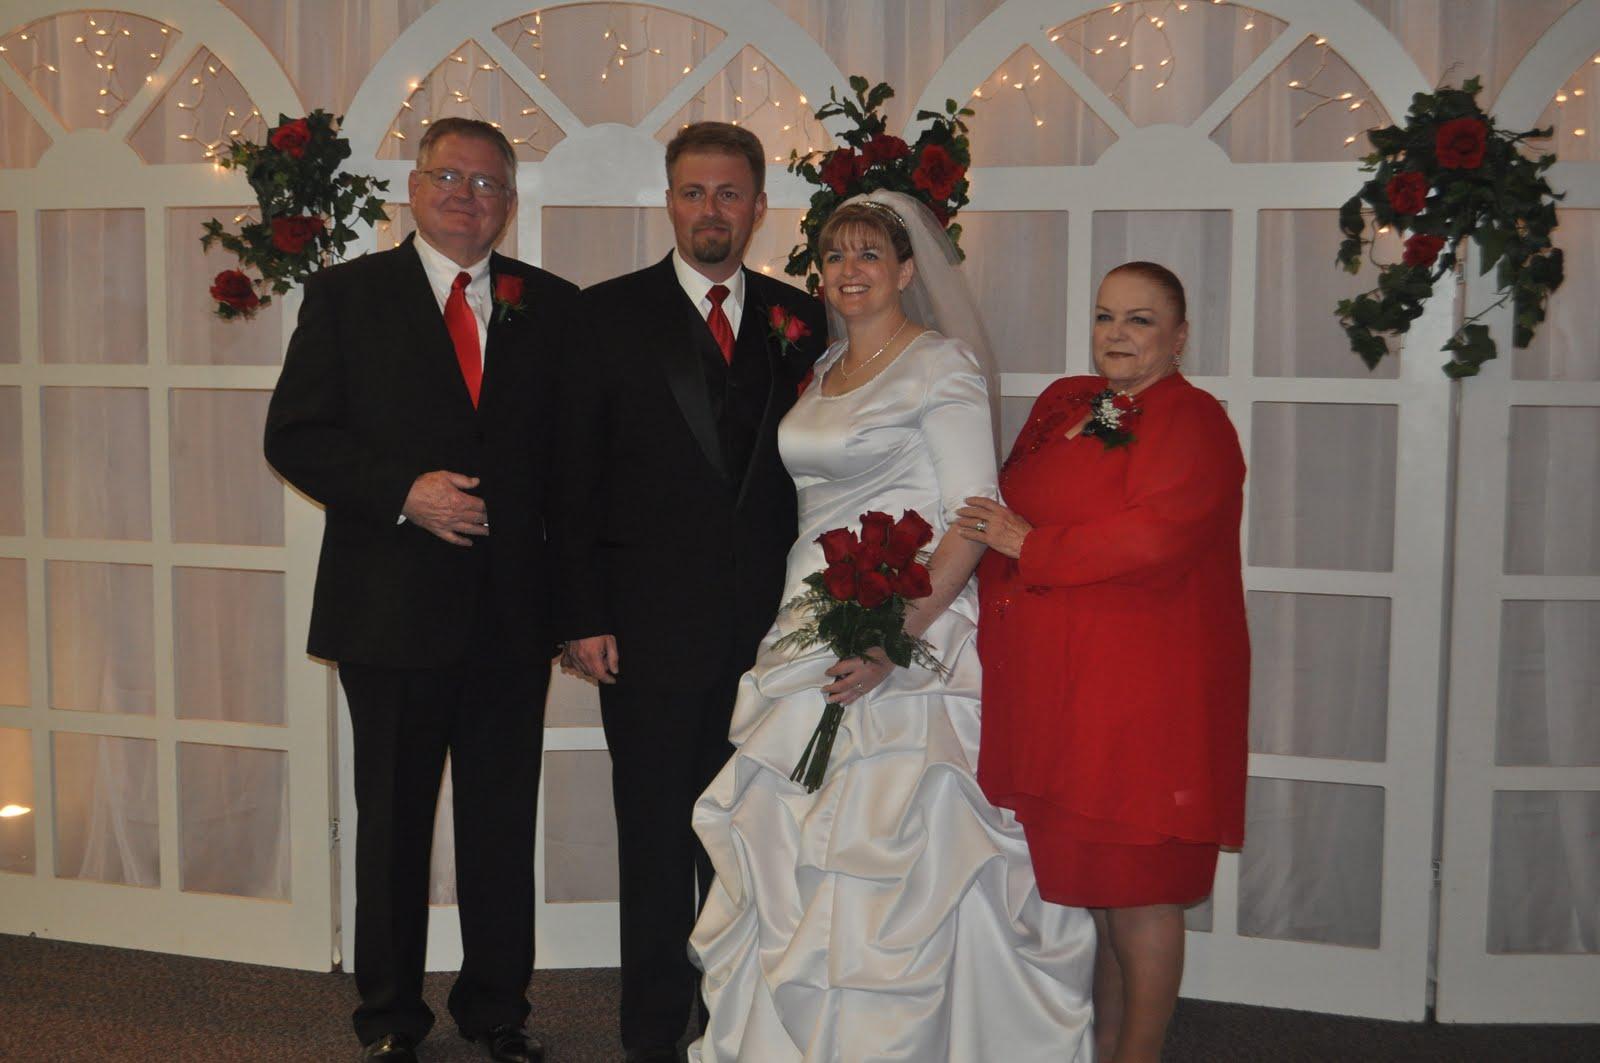 http://3.bp.blogspot.com/_iN8nY_Avlk0/TBaiiEZ-D1I/AAAAAAAAAPQ/9dcdL2Pl8TU/s1600/wedding+073.jpg